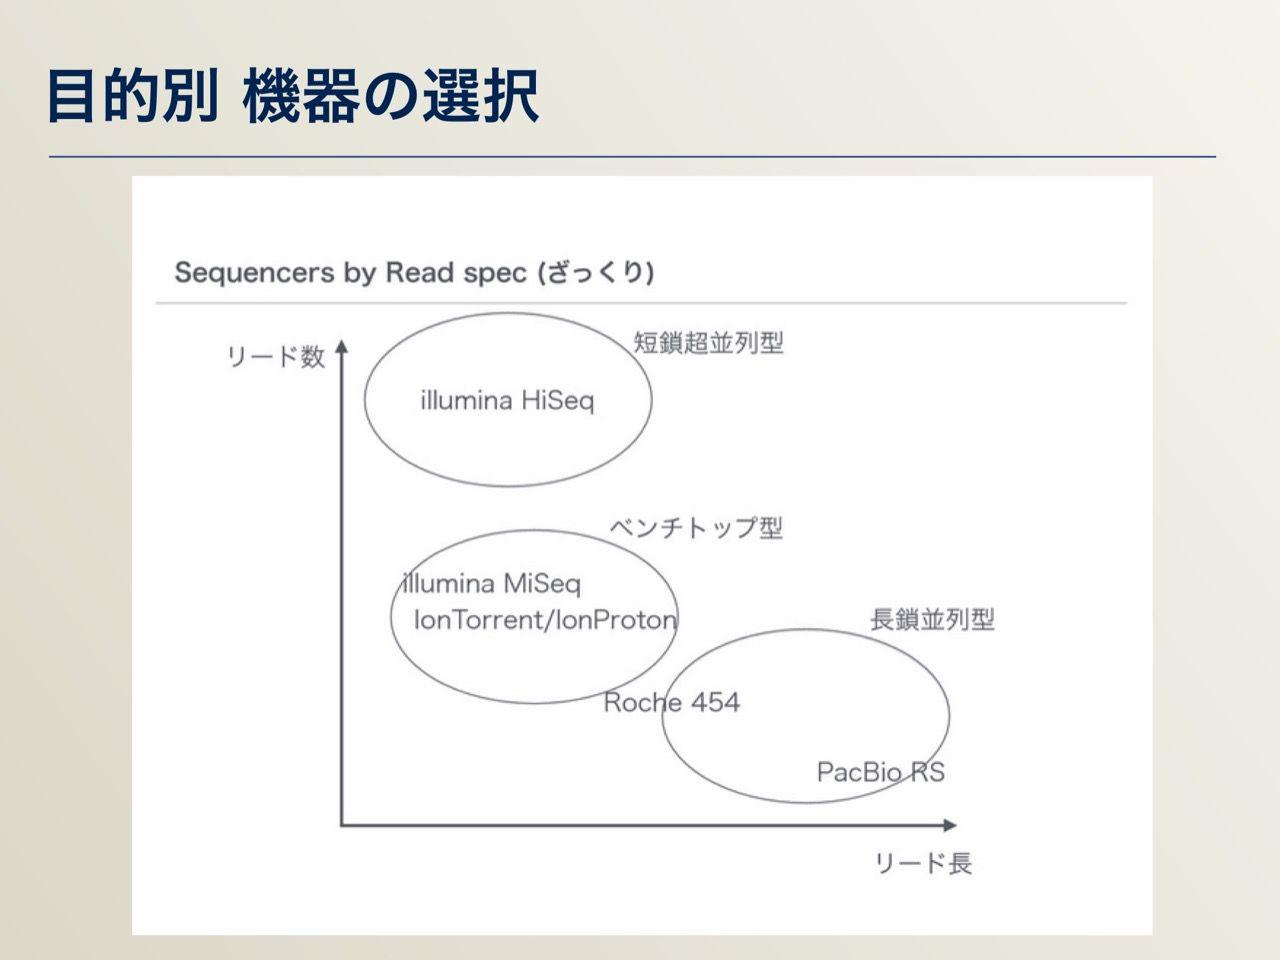 images/AJACS64_03_nakazato_006.jpg